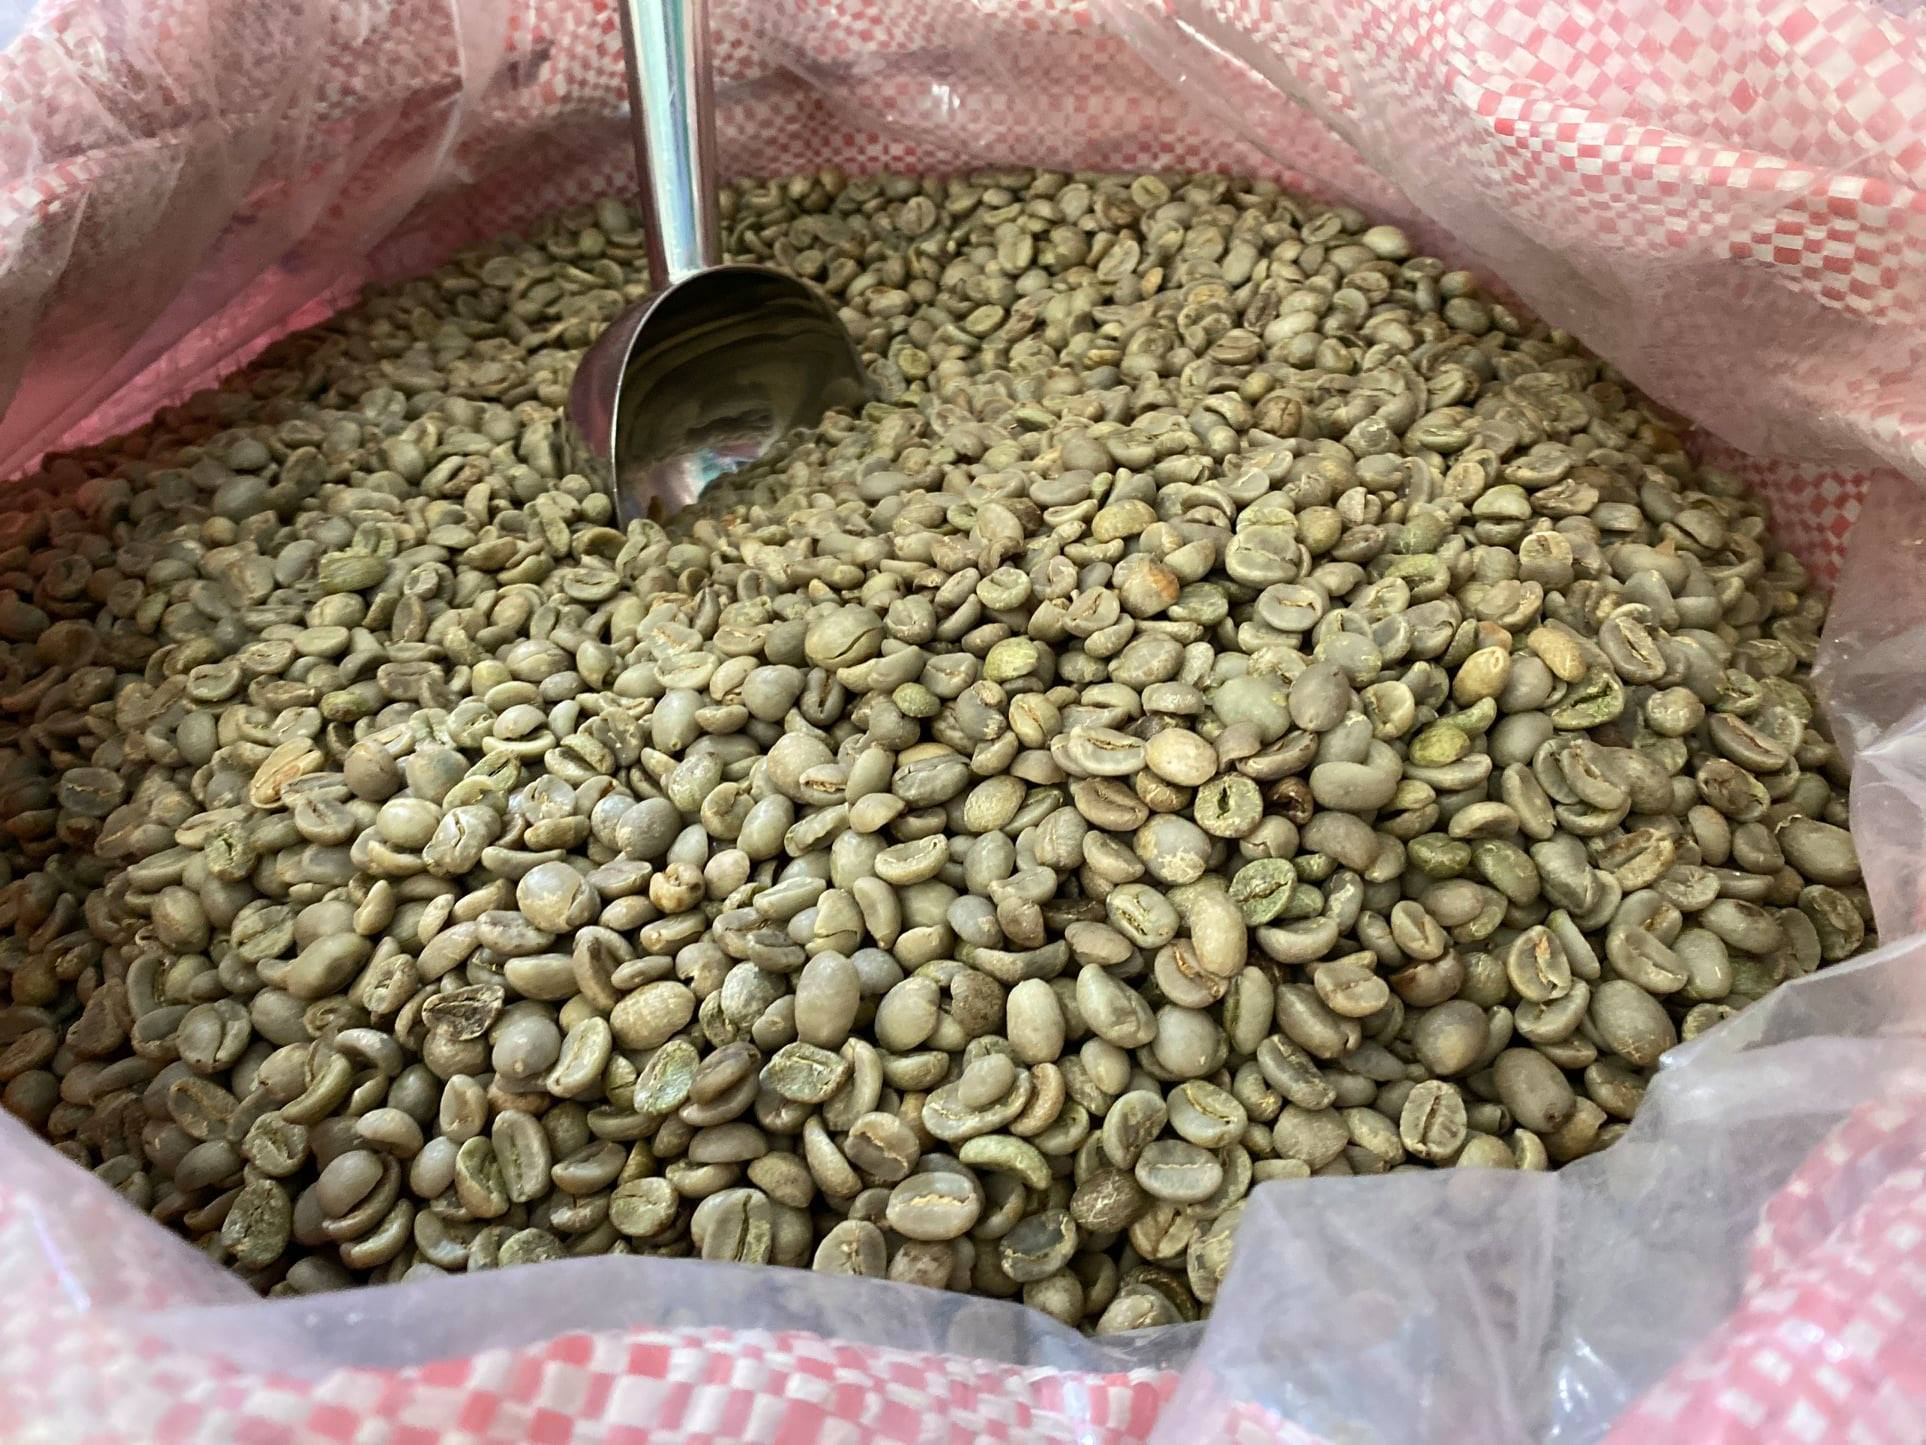 Vietnam green coffee bean supplier, coffee companies in vietnam, manufacturers, exporters, coffee bean supplier in Vietnam